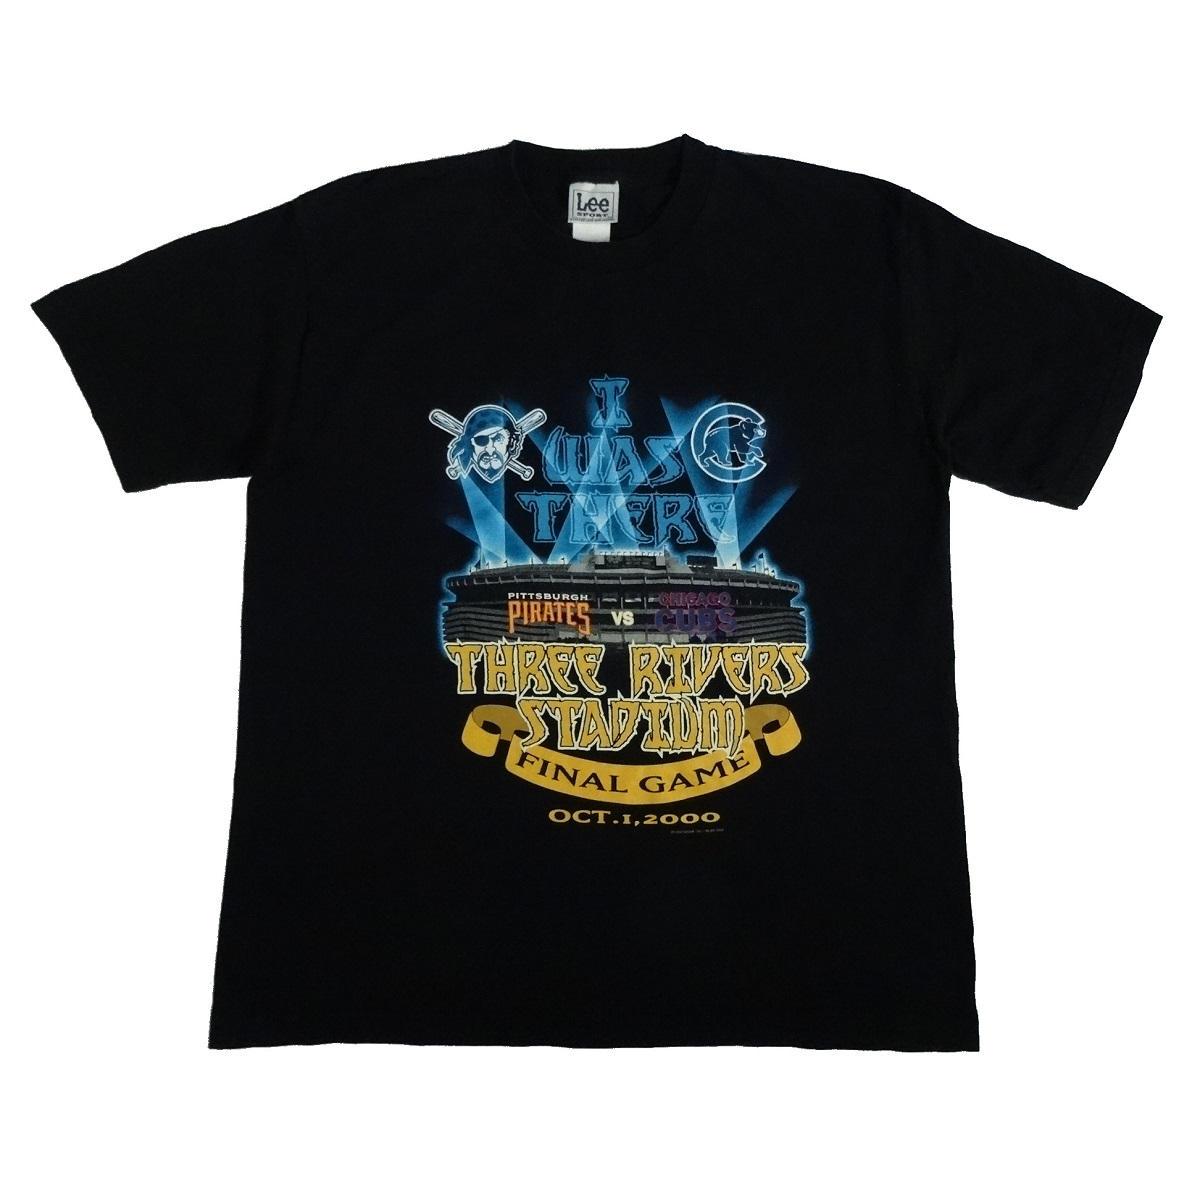 three rivers stadium pirates last game t shirt front